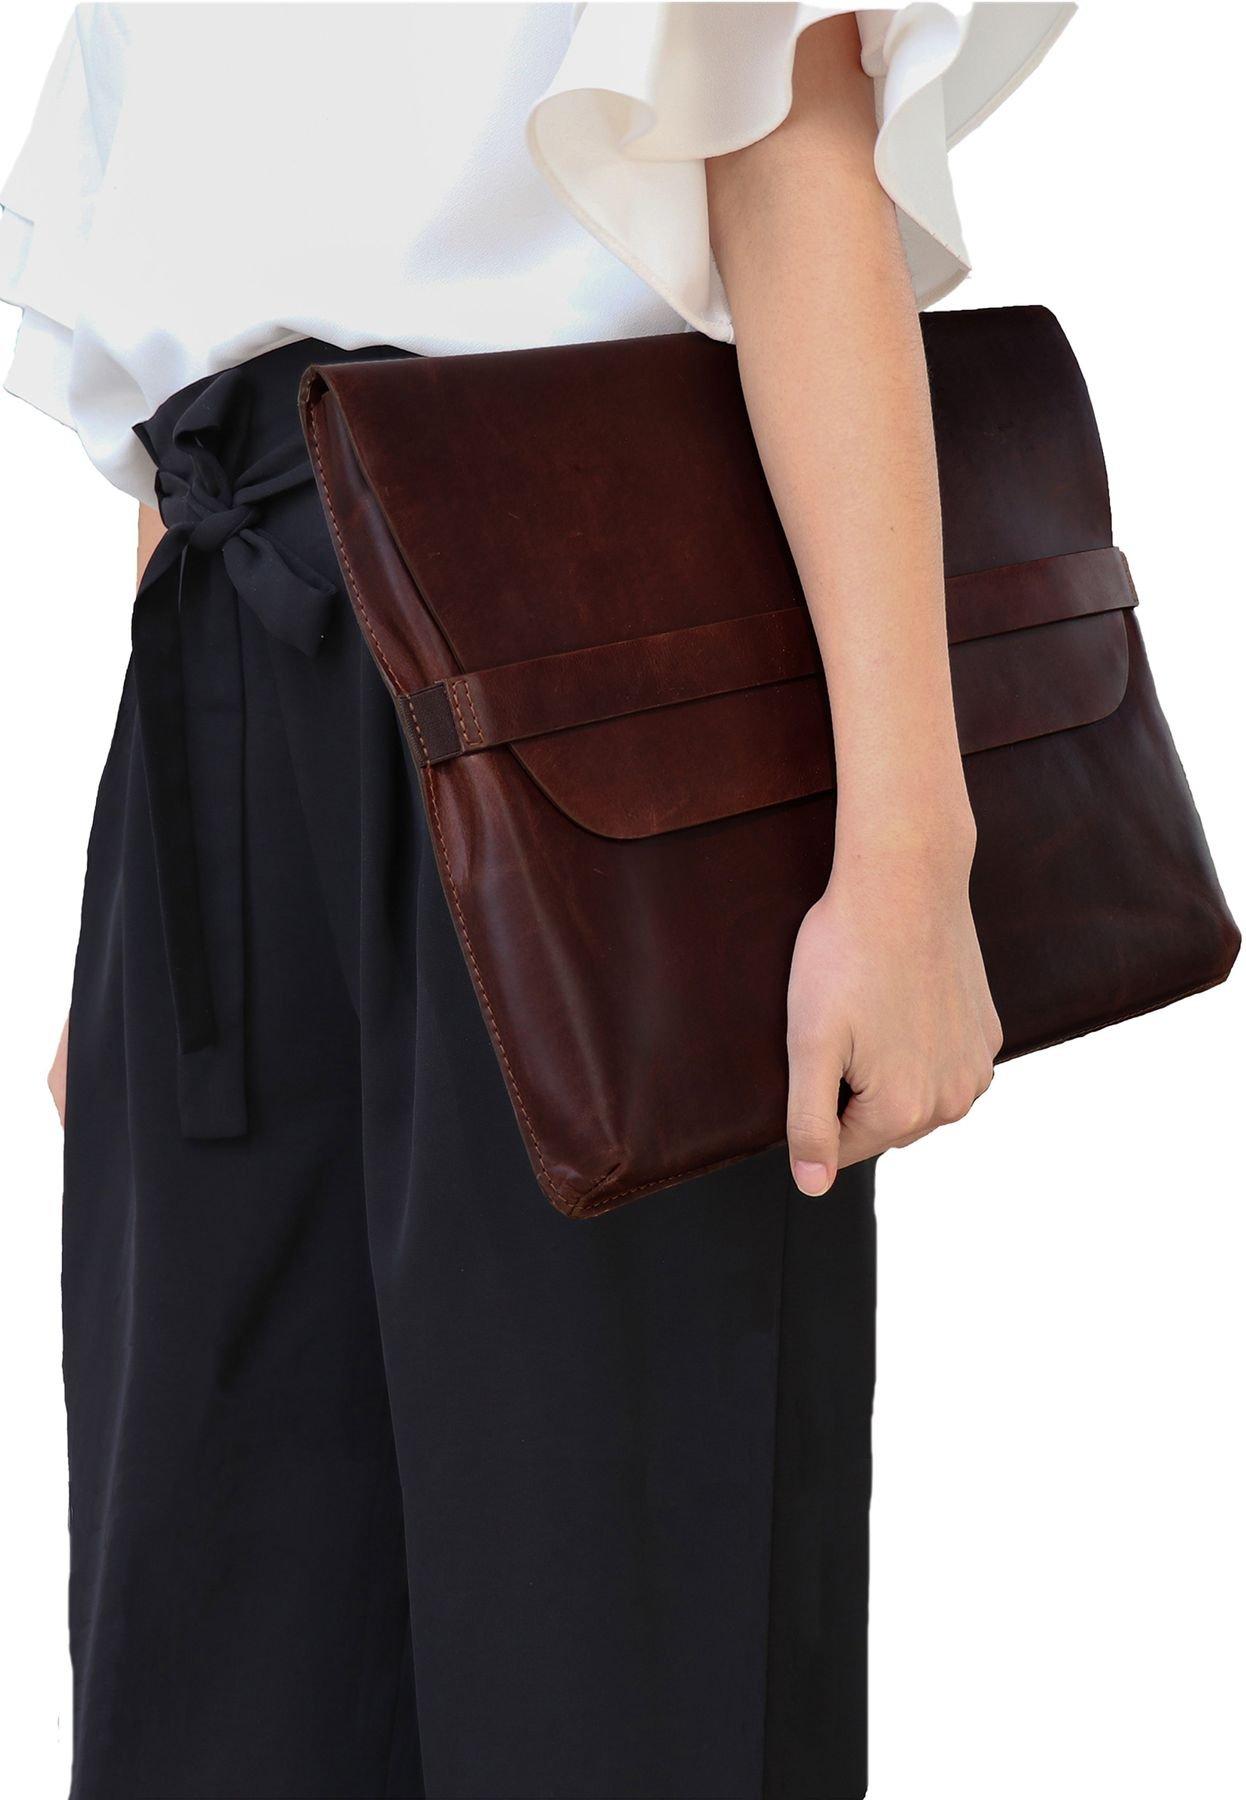 Damen LAPTOP-HÜLLE - HARVORD - Notebooktasche